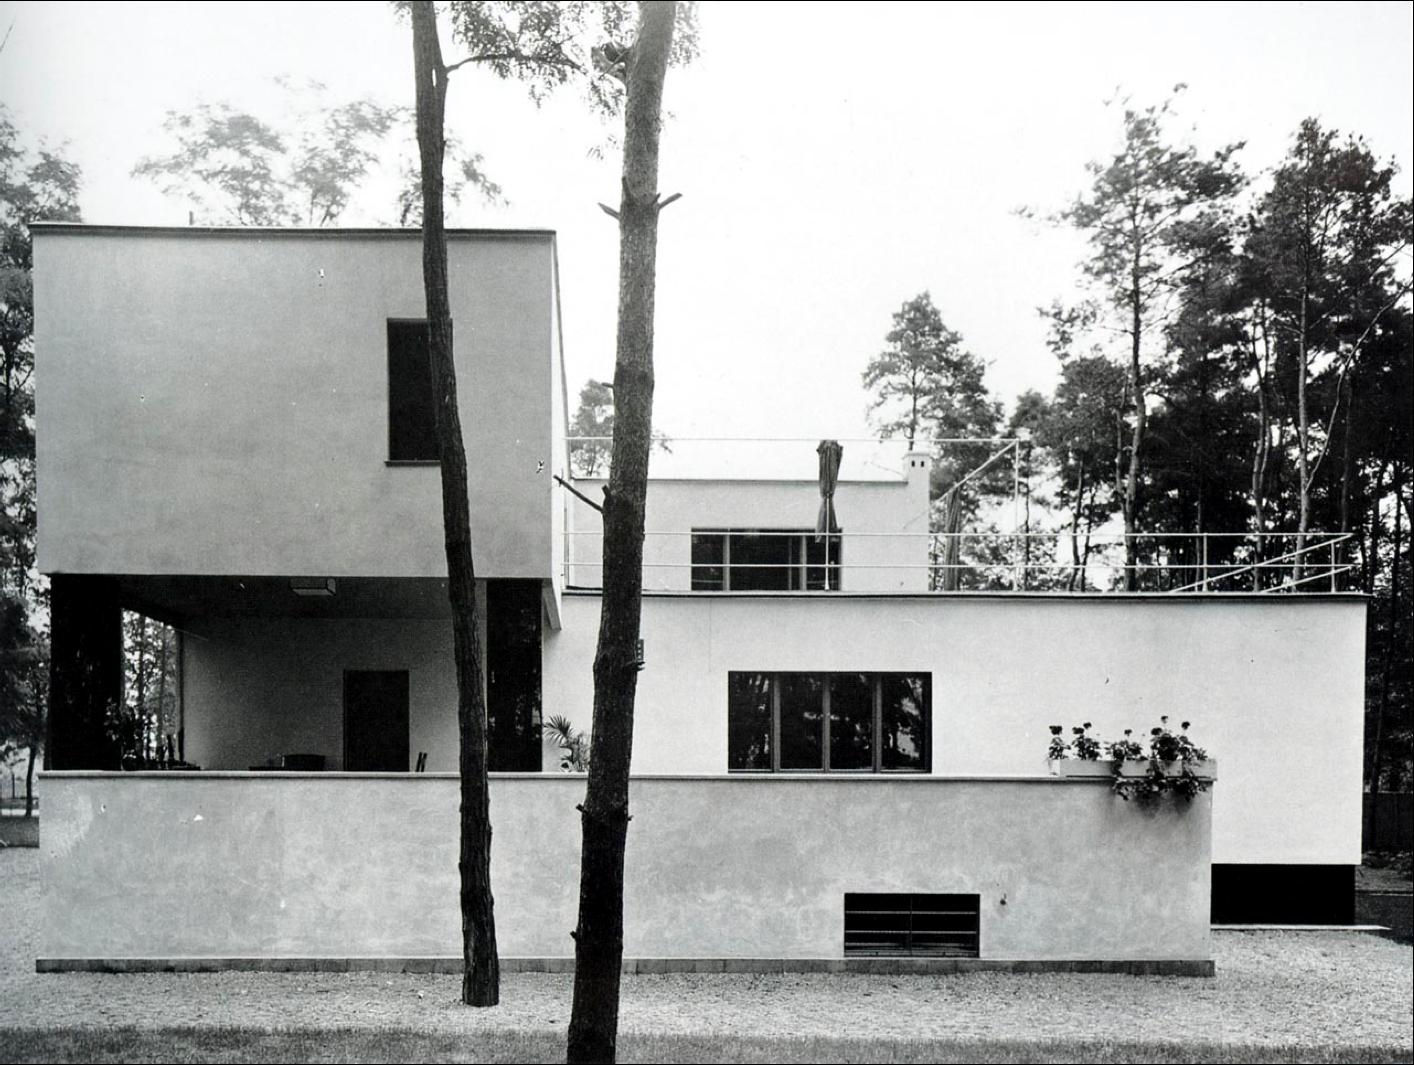 1925 1926 gropius 39 house in dessau walter gropius ernst neufert 1414 1065 arch. Black Bedroom Furniture Sets. Home Design Ideas